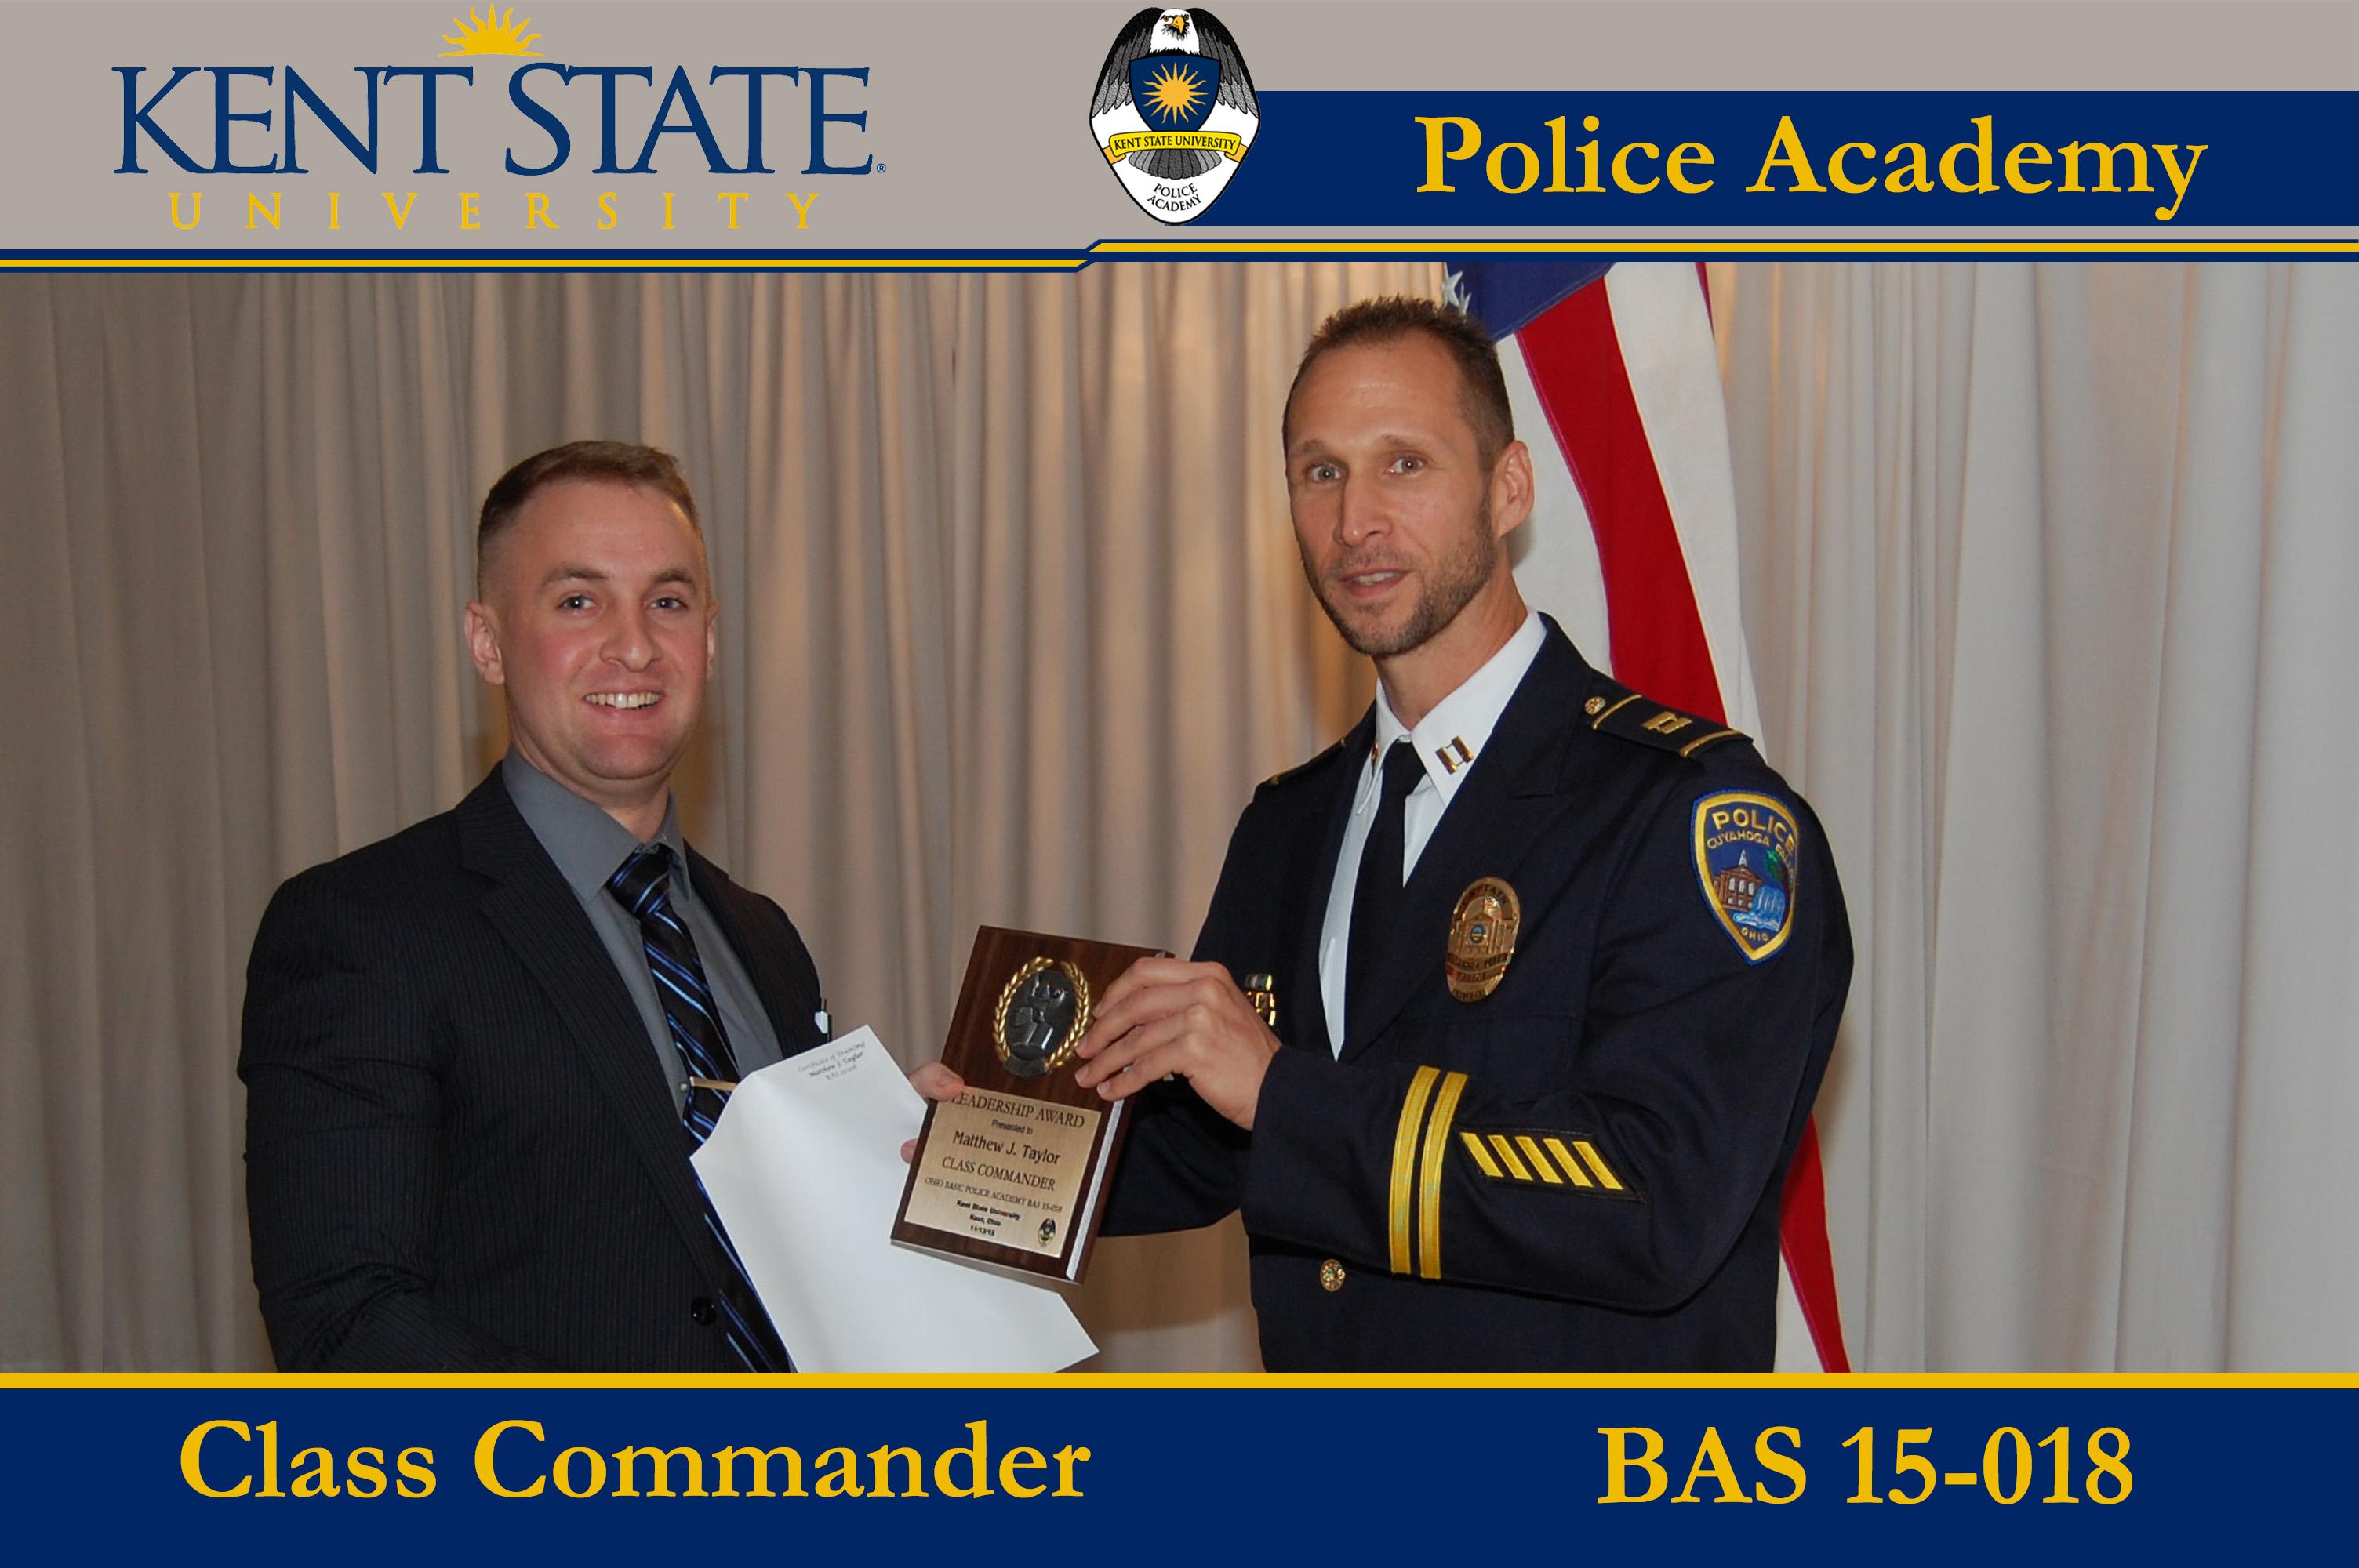 Cadet Receiving Award for Class Commander